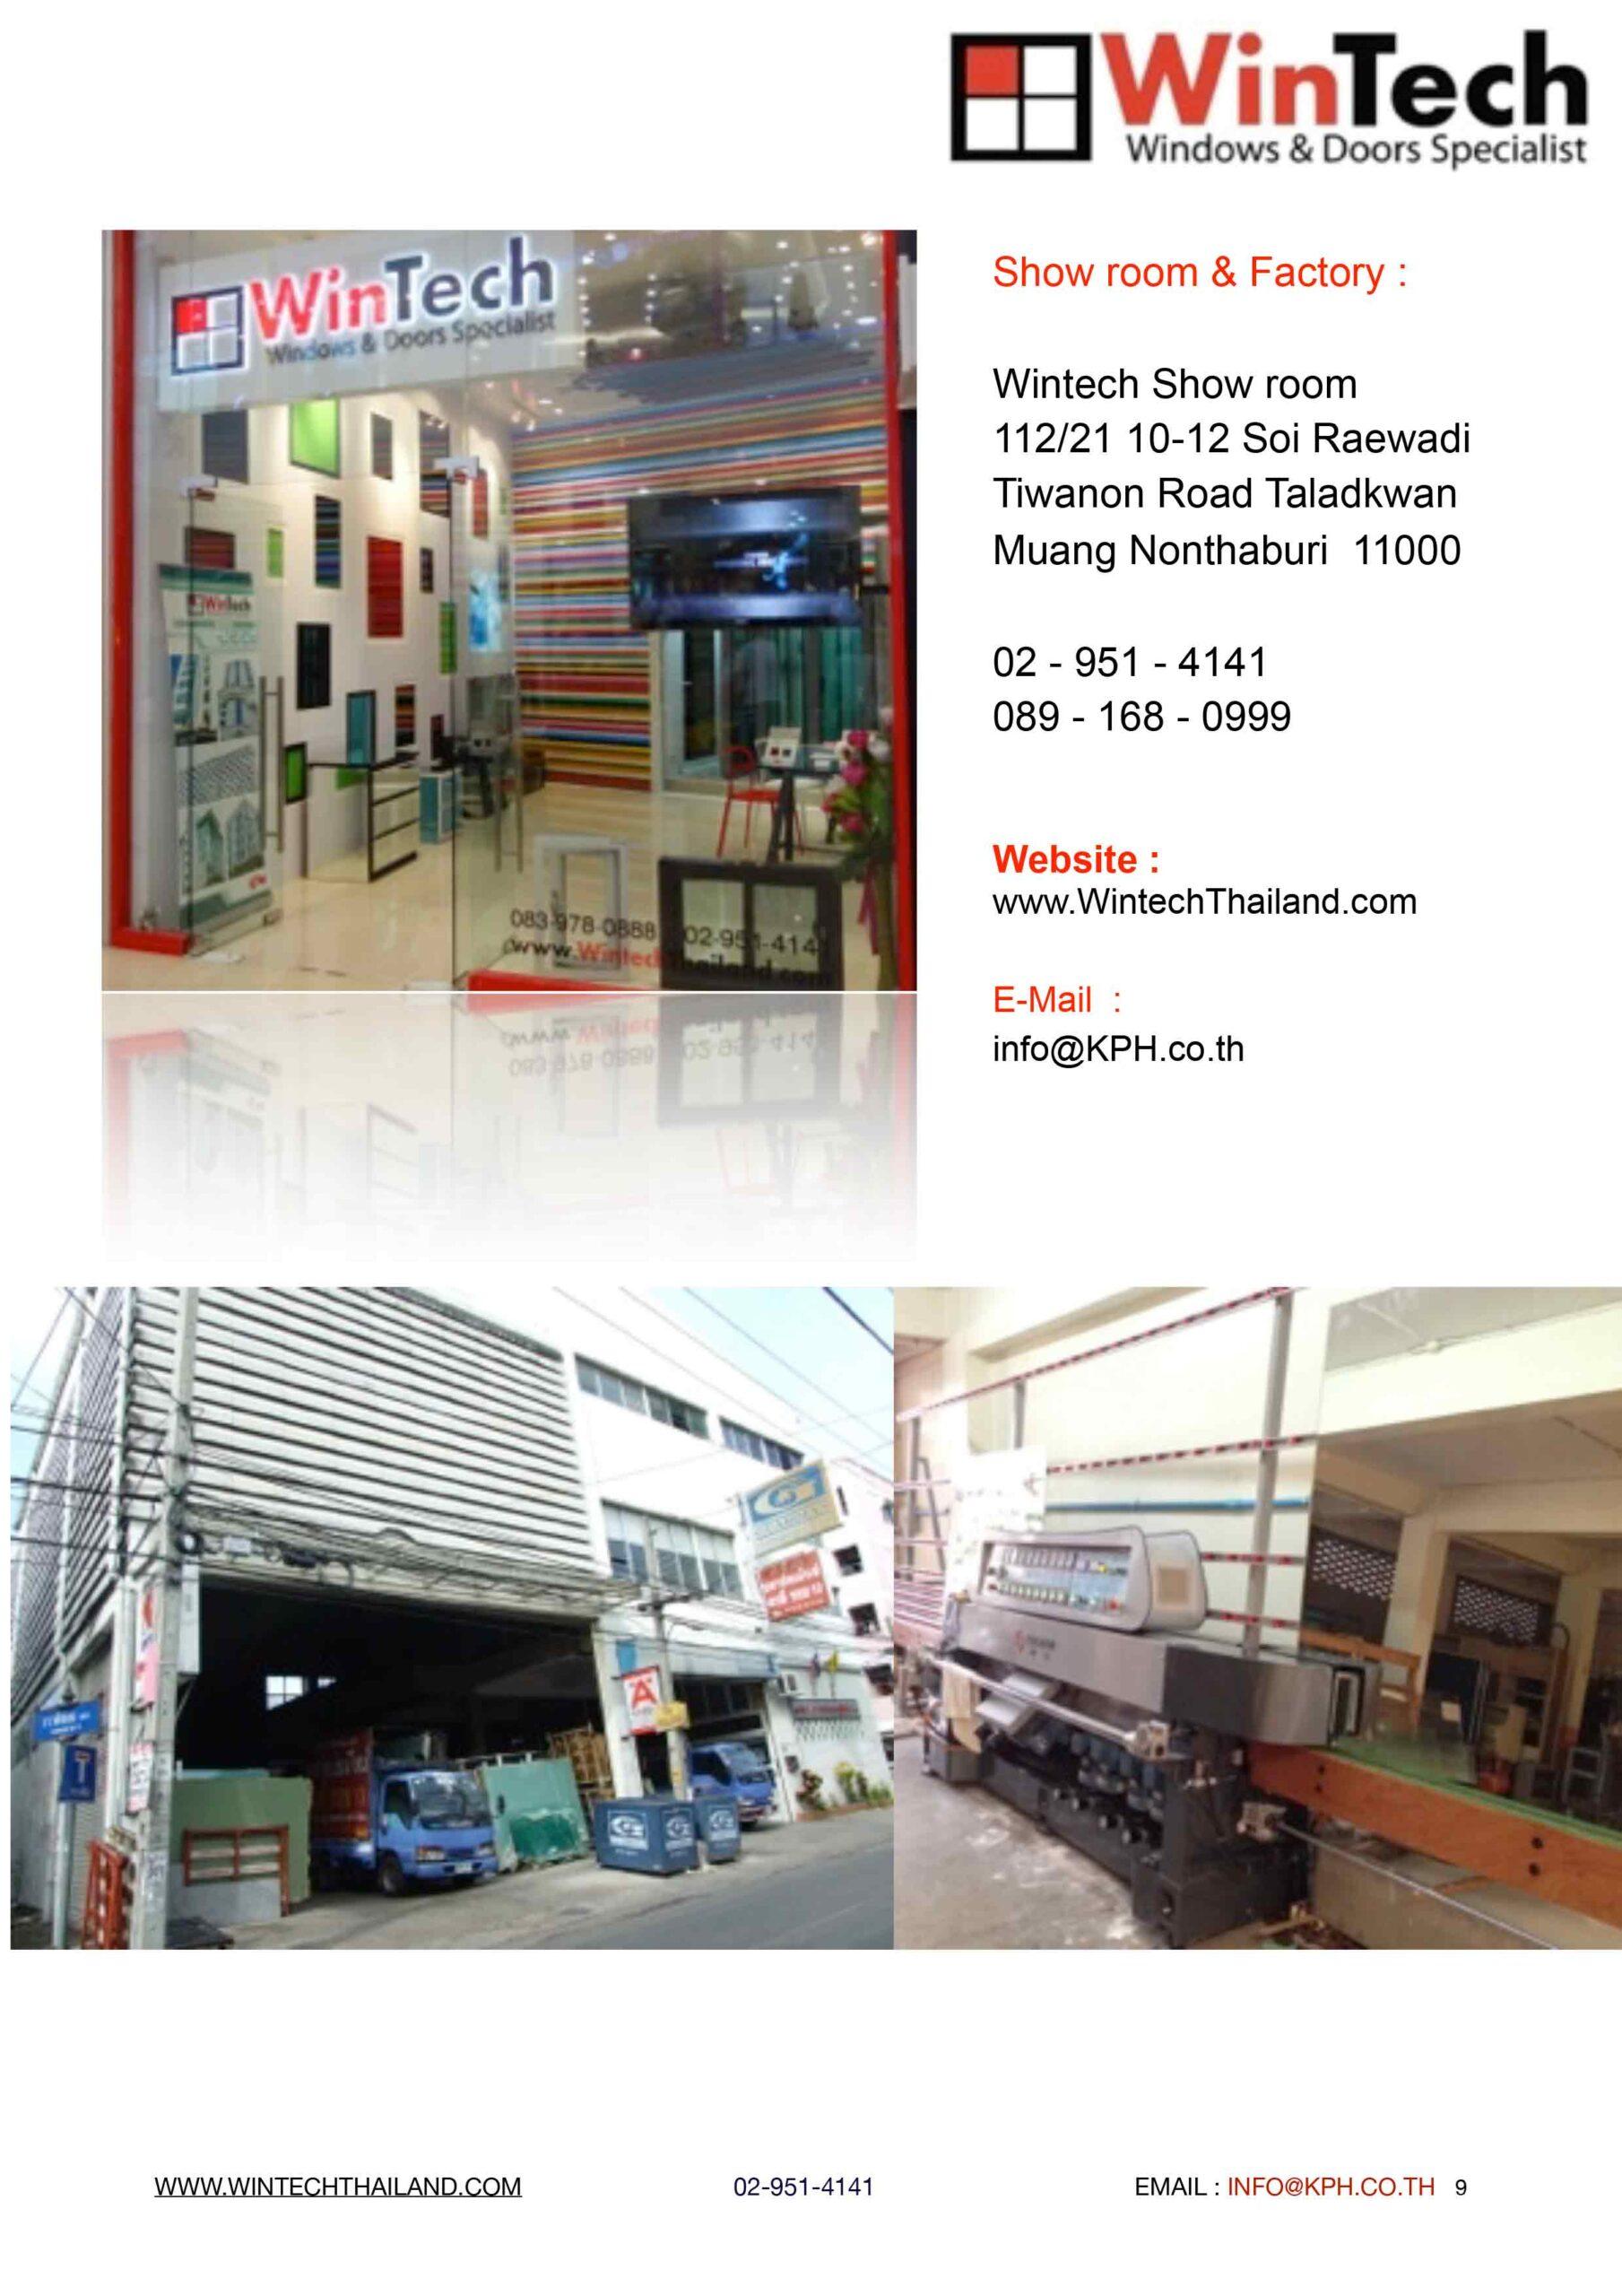 Wintech-Italy-Brochure-commp-9